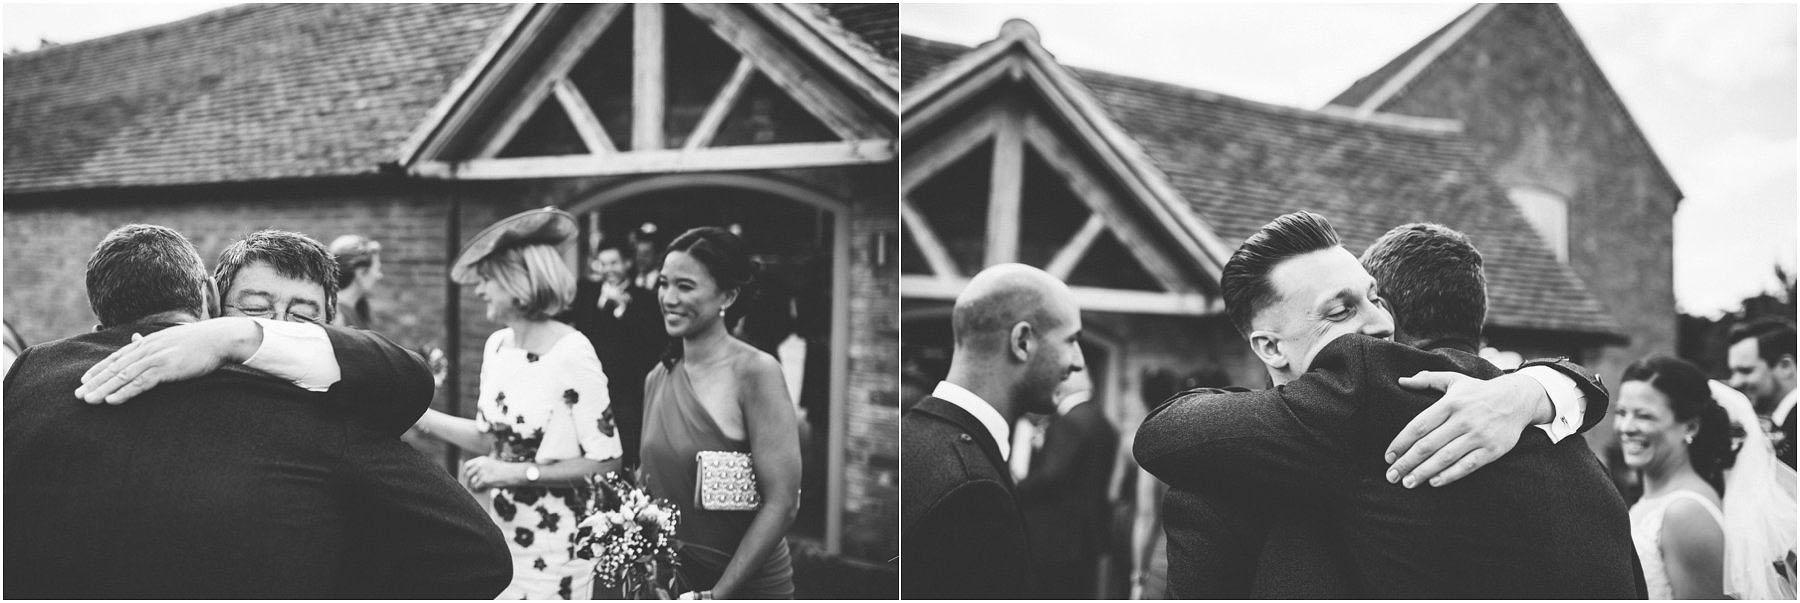 Swallows_Nest_Barn_Wedding_Photography_0100